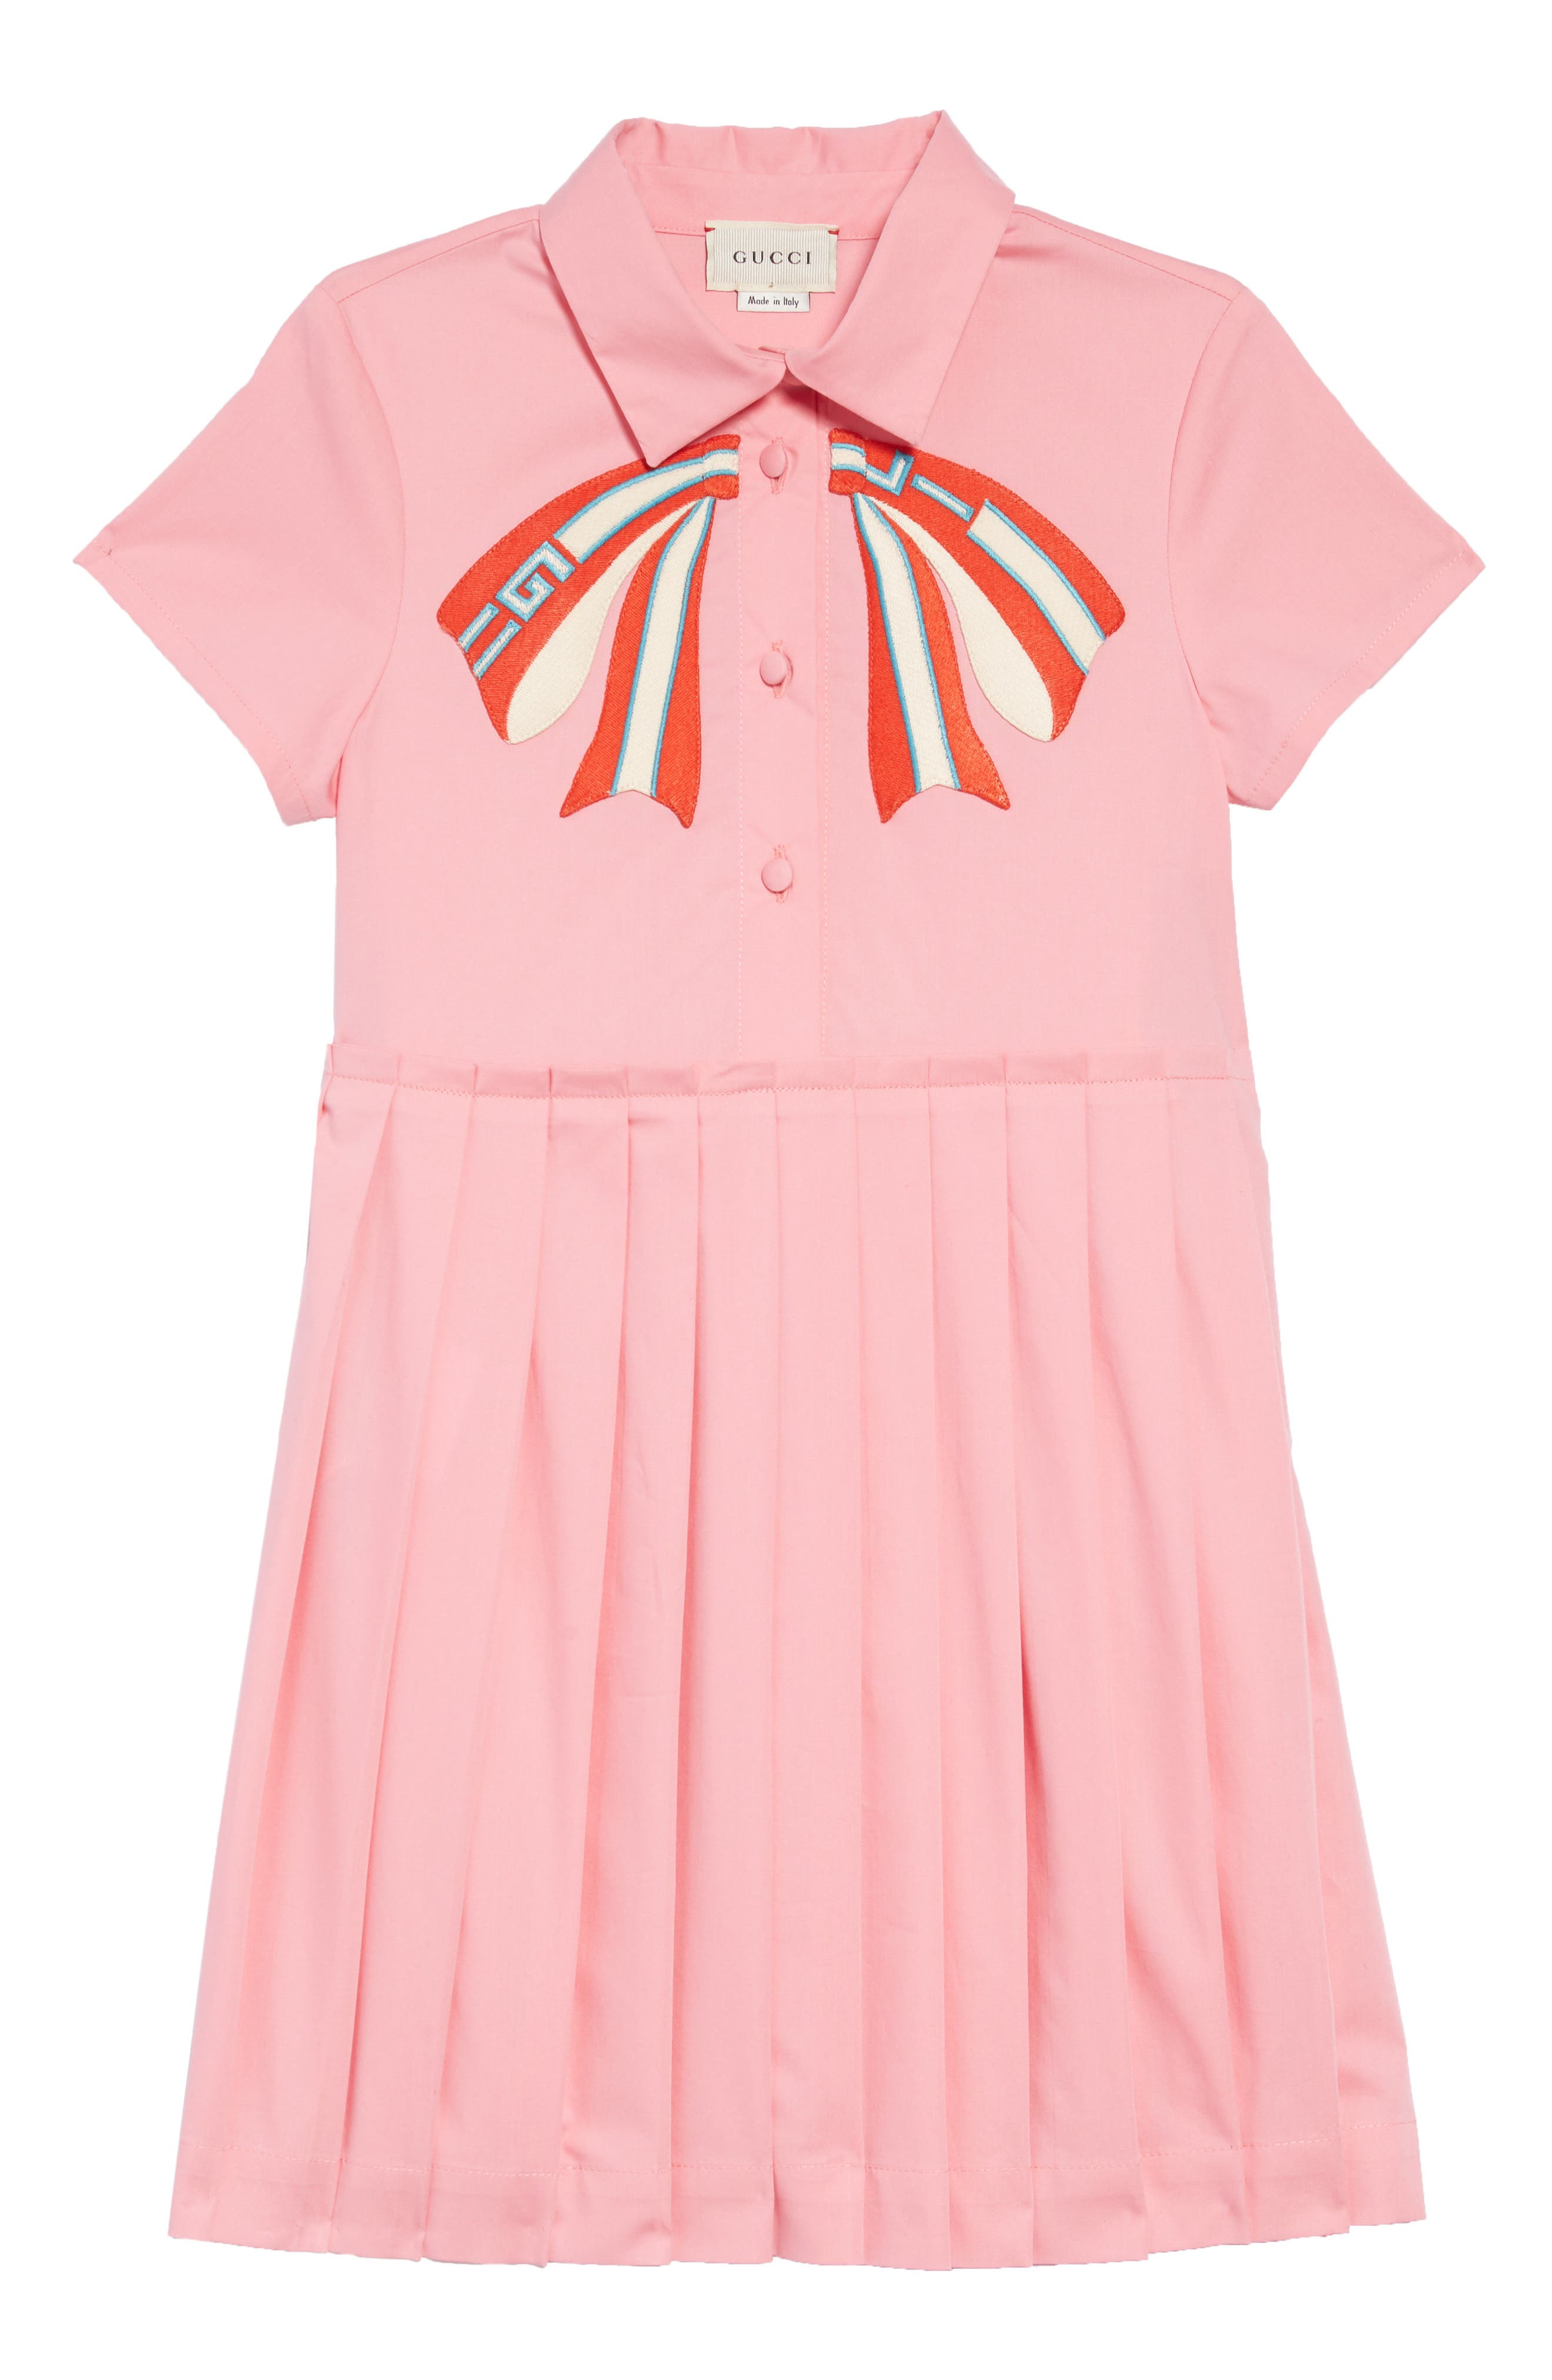 29a176524 Gucci Kids - Girls Dresses